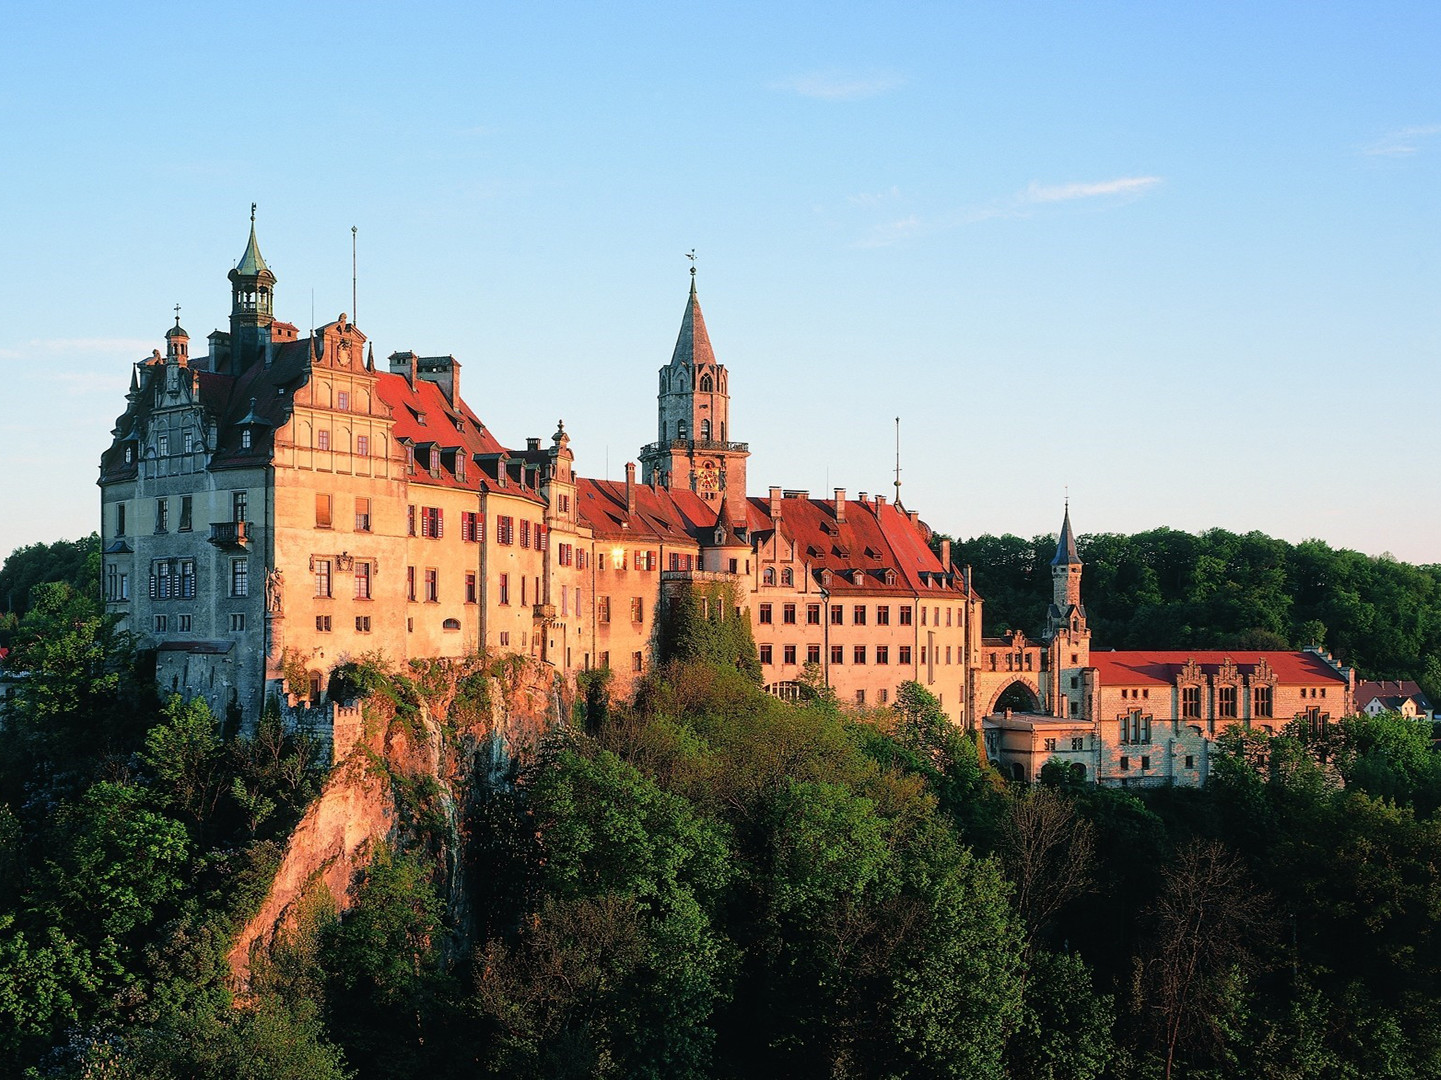 Ansicht des Hohenzollernschloss Sigmaringen